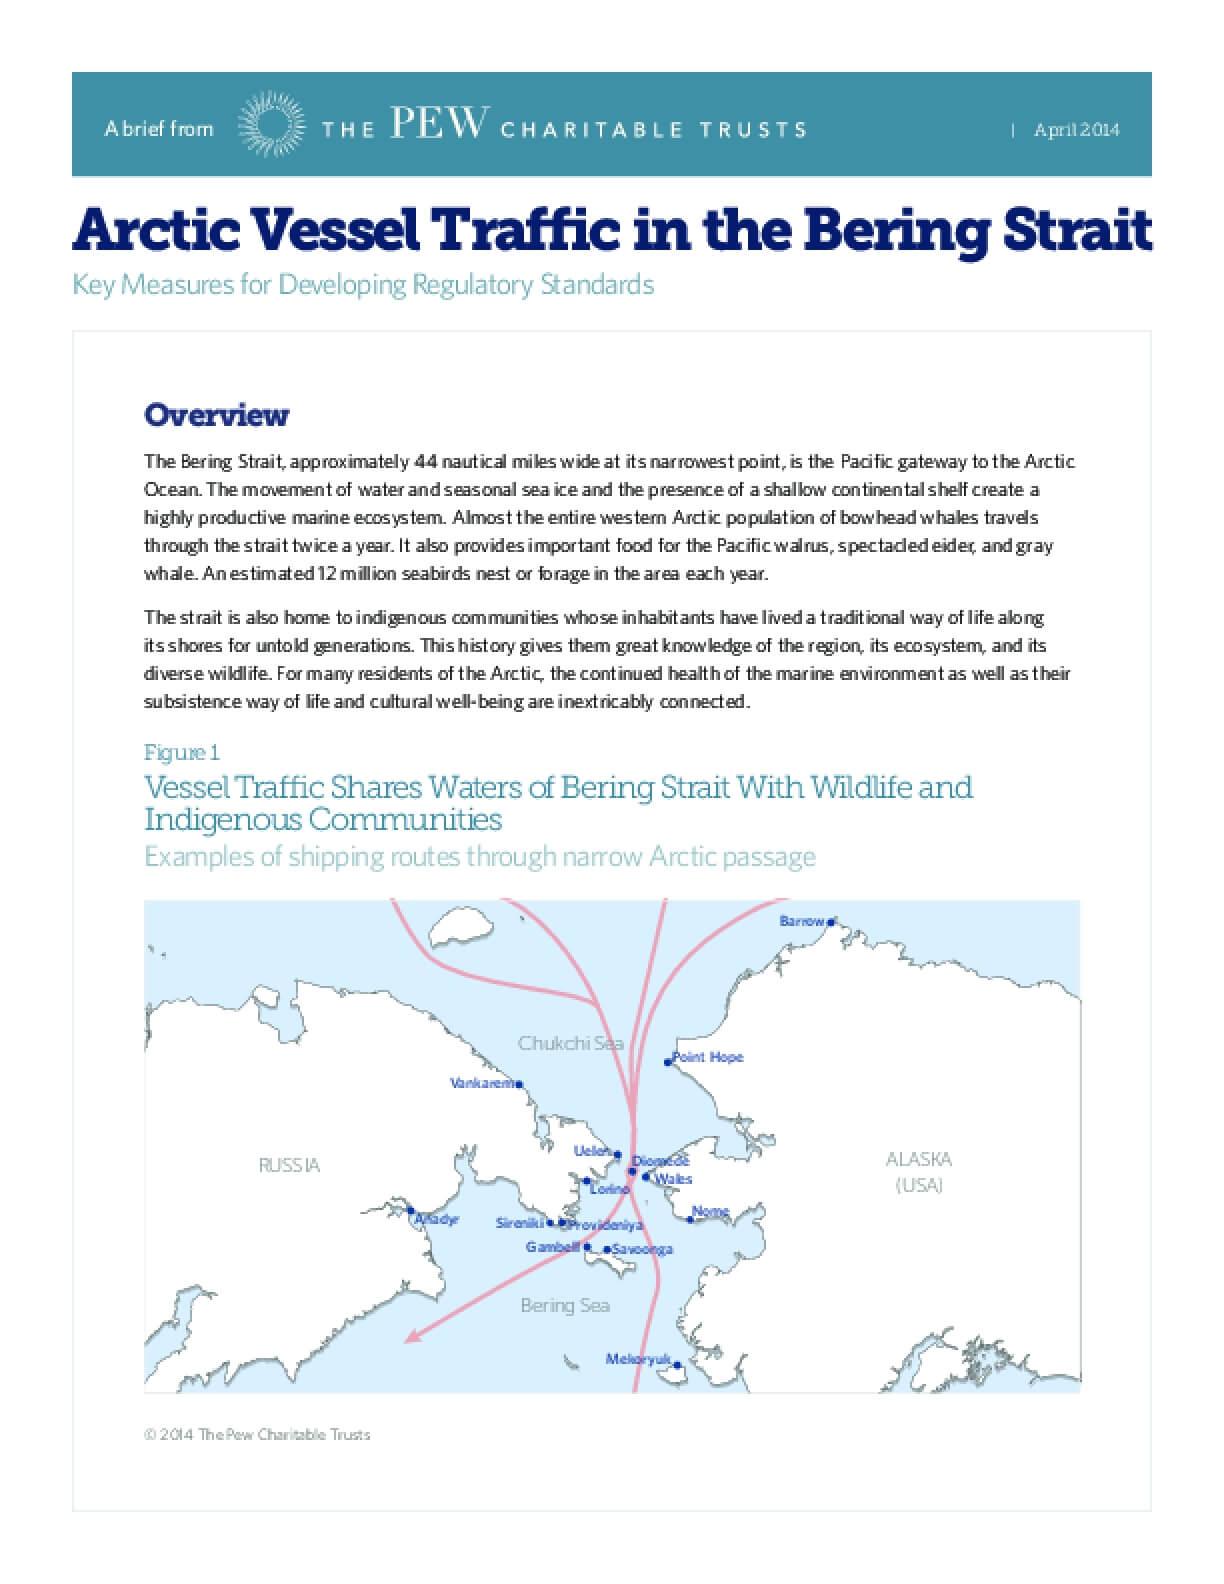 Arctic Vessel Traffic in the Bering Strait